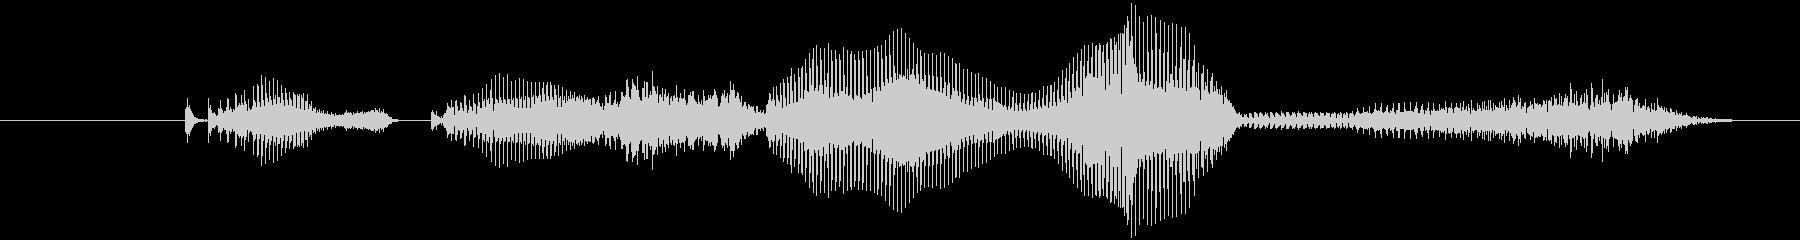 It's noisy (female)'s unreproduced waveform